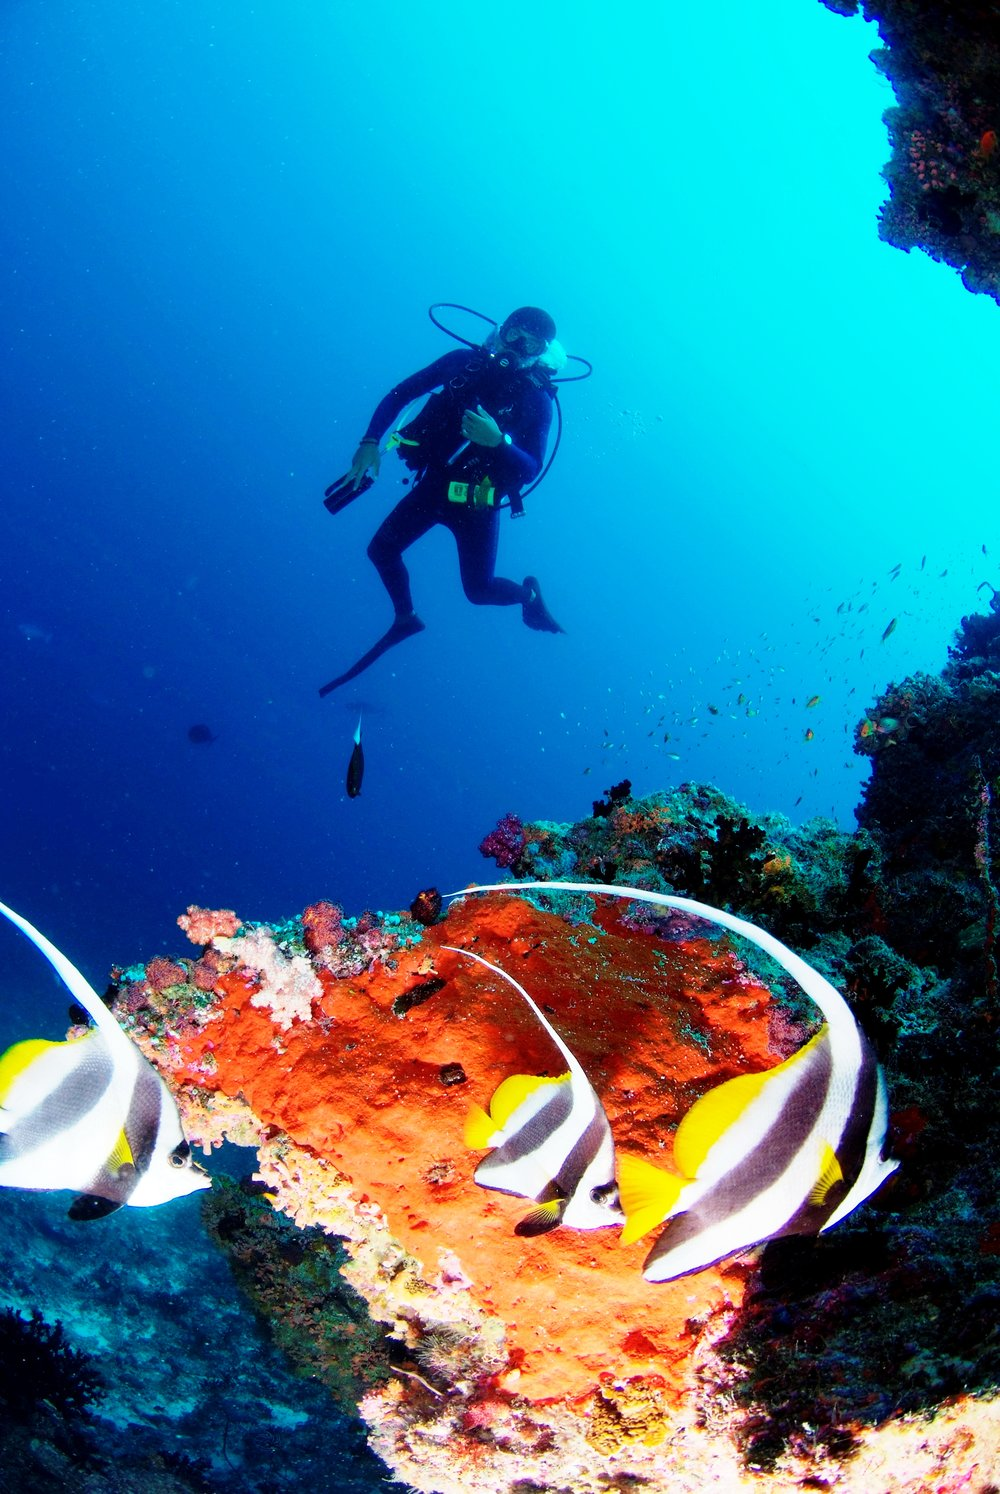 Anantara_Dhigu_Diving.JPG